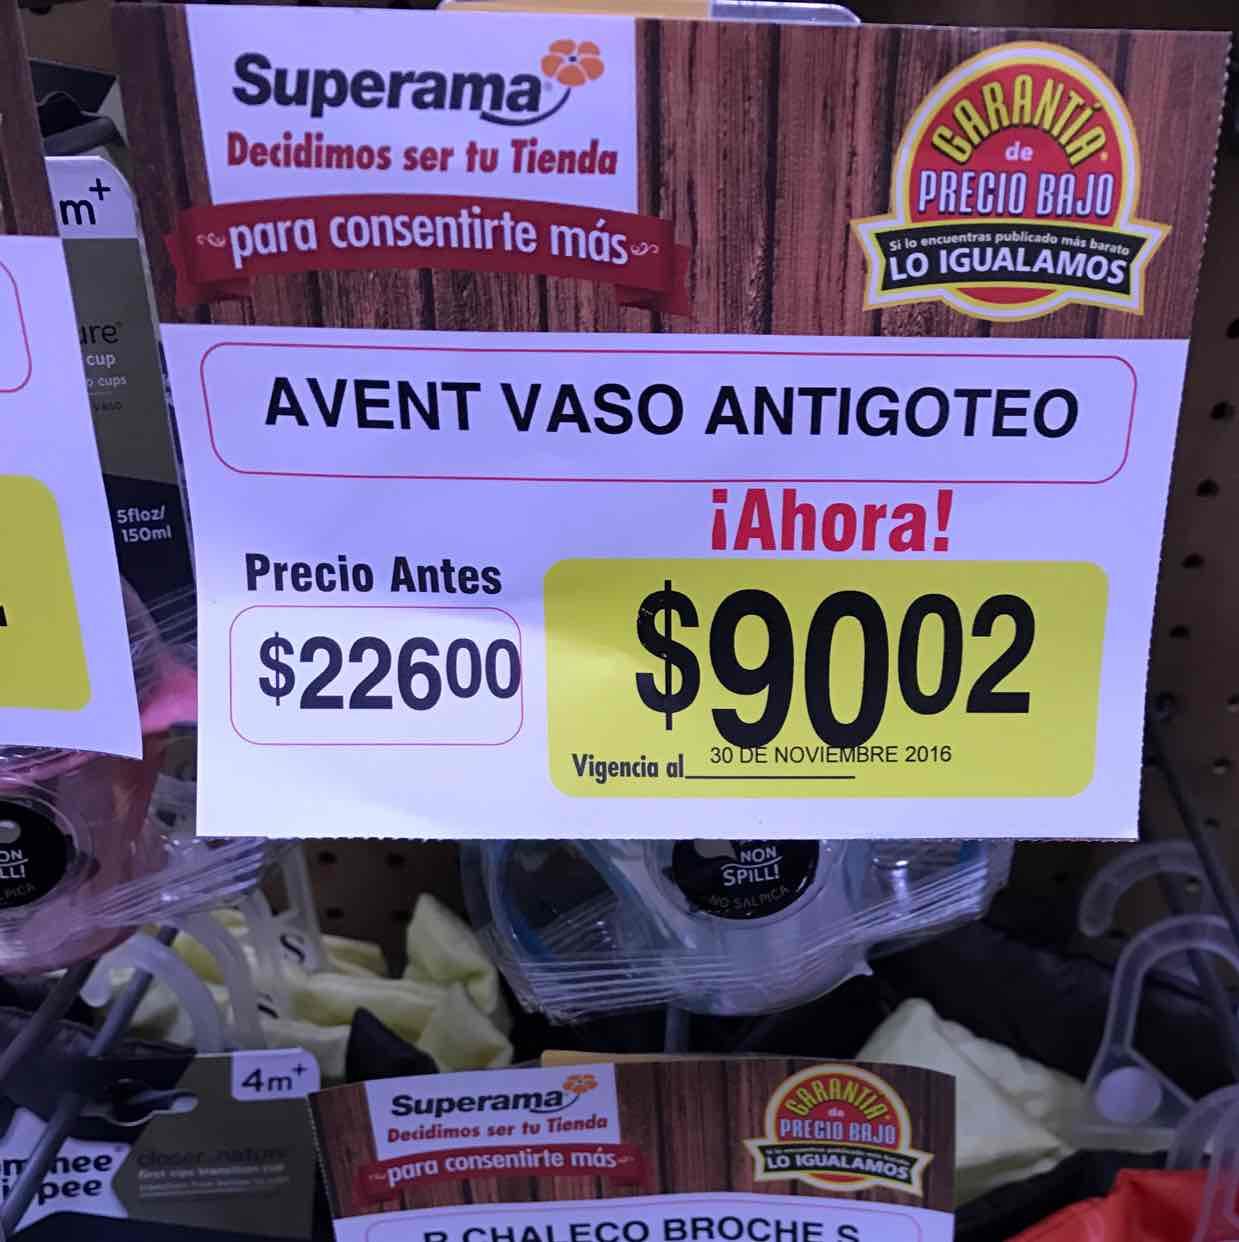 Superama: vaso antigoteo a $90.02